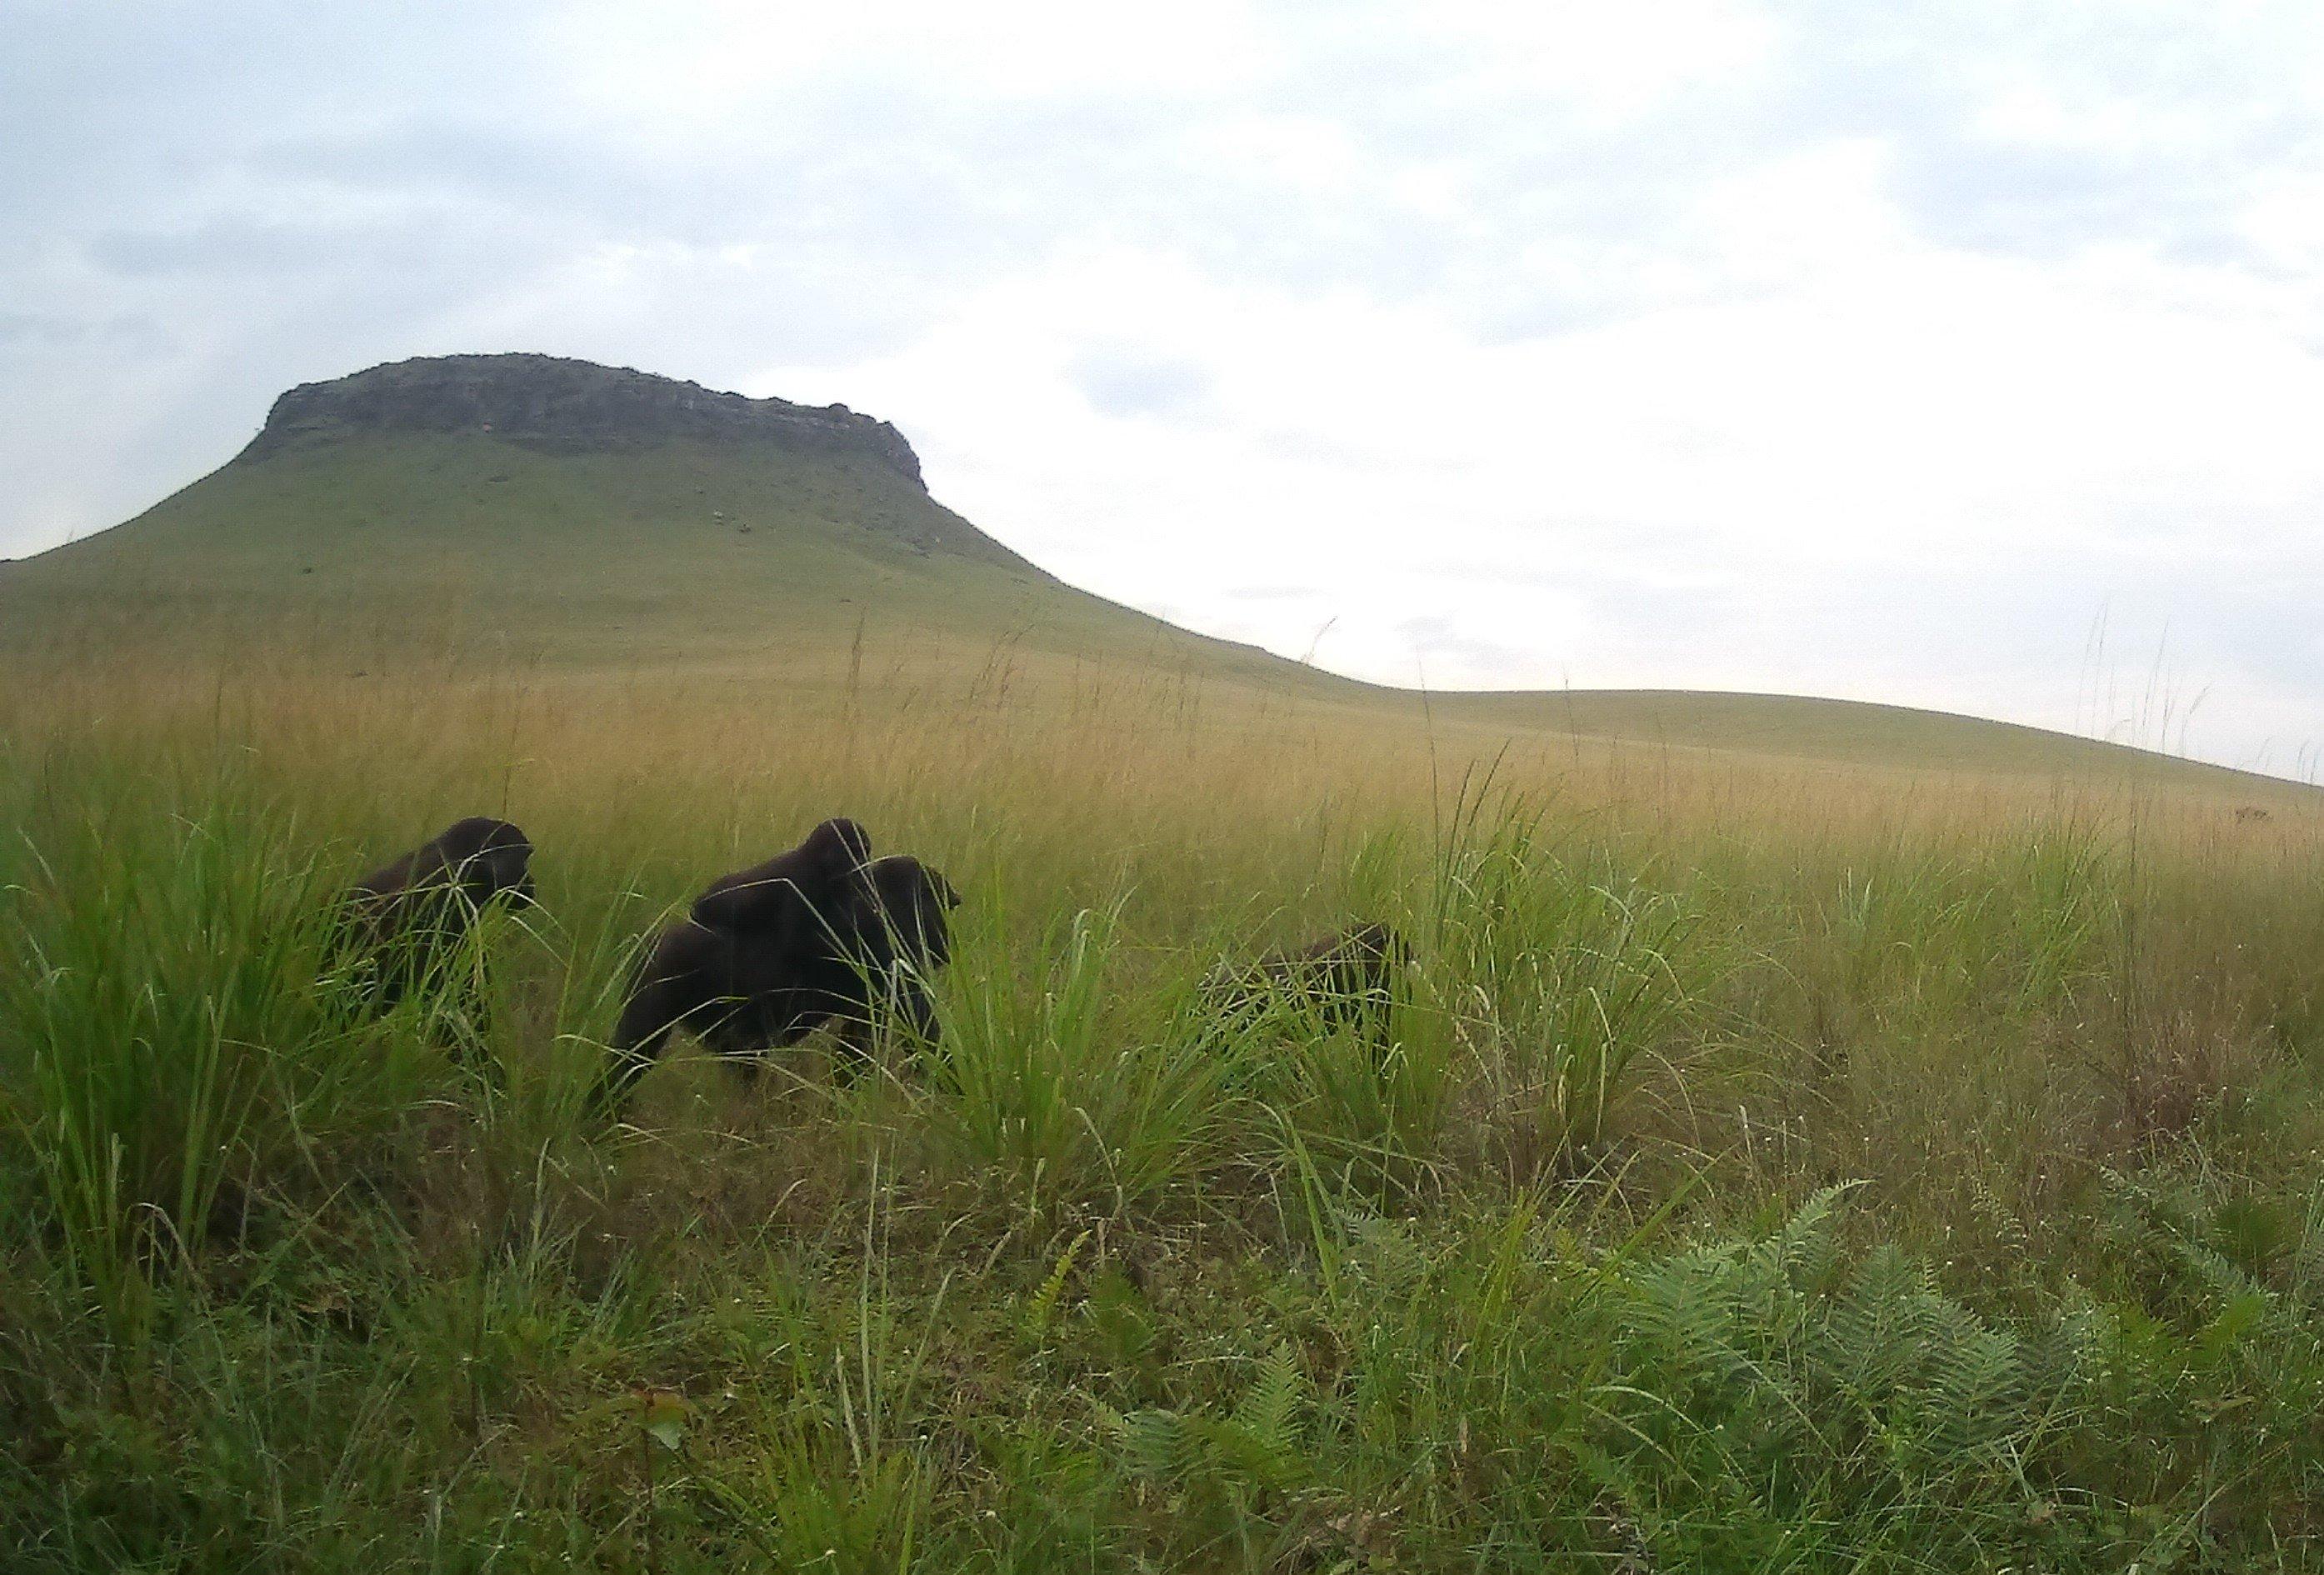 2020A-160 Congo Camera Trap Image - Makouas Group Jan 2021